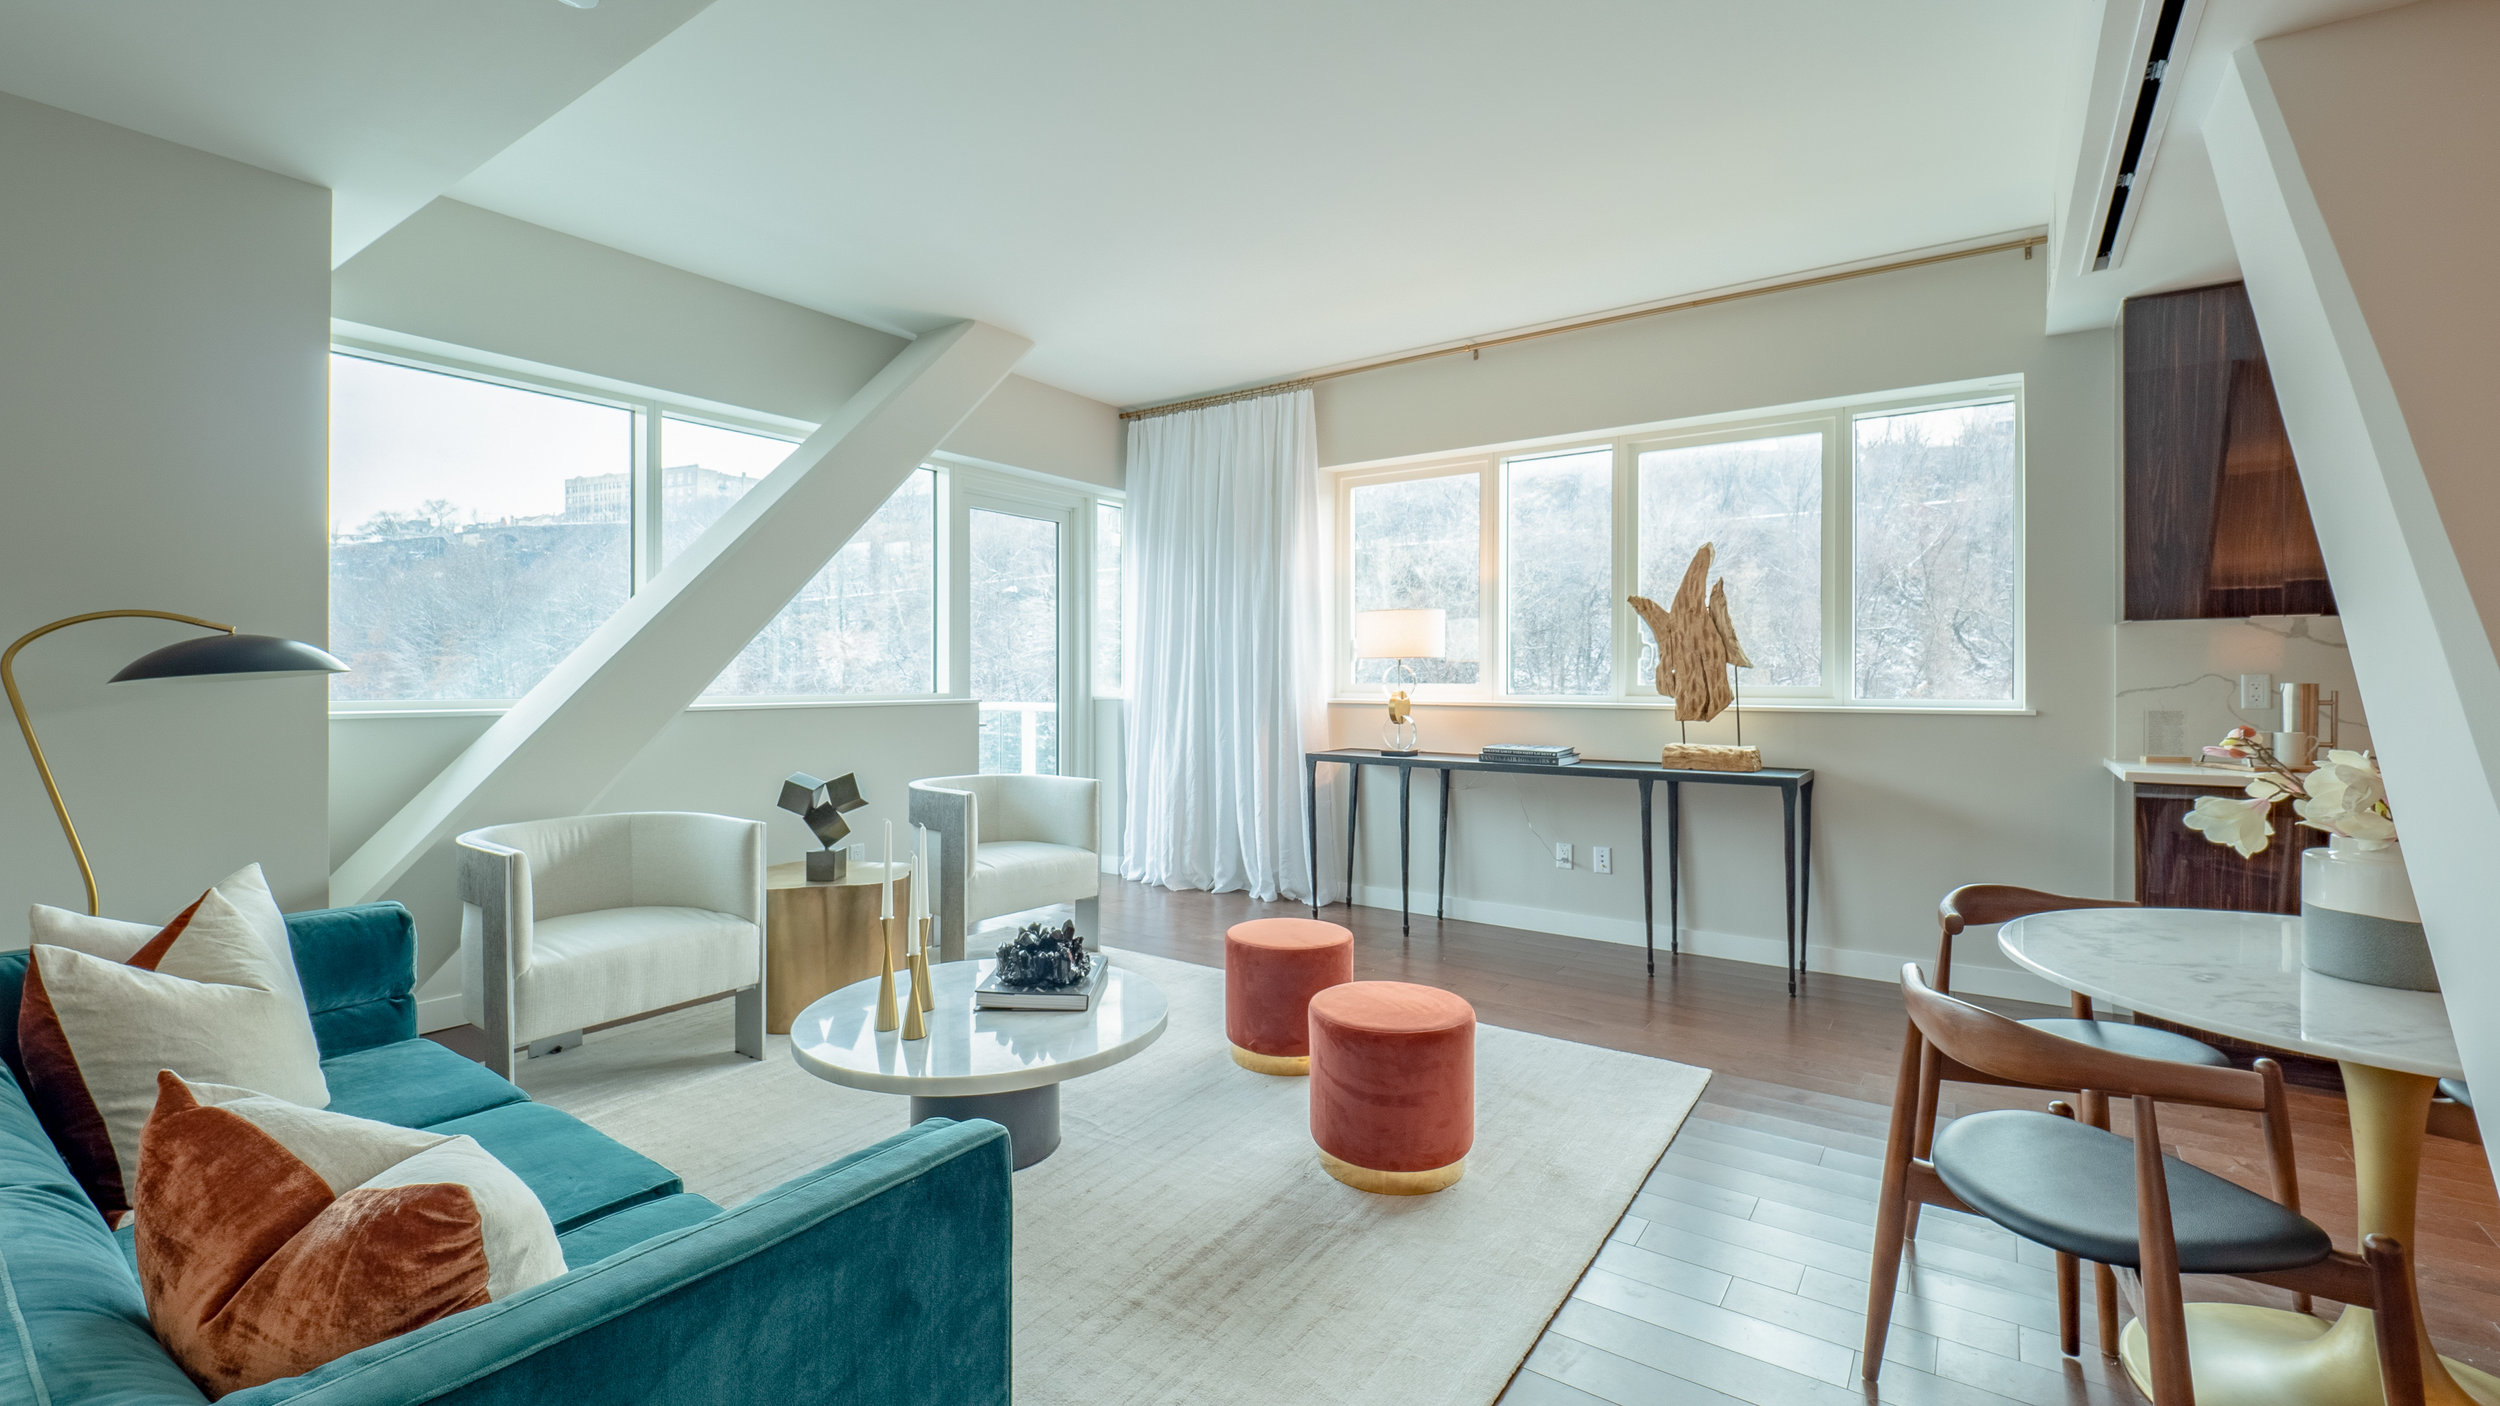 Peek Inside A Newly Revealed Residence At Avora On Weekhawken's Gold Coast